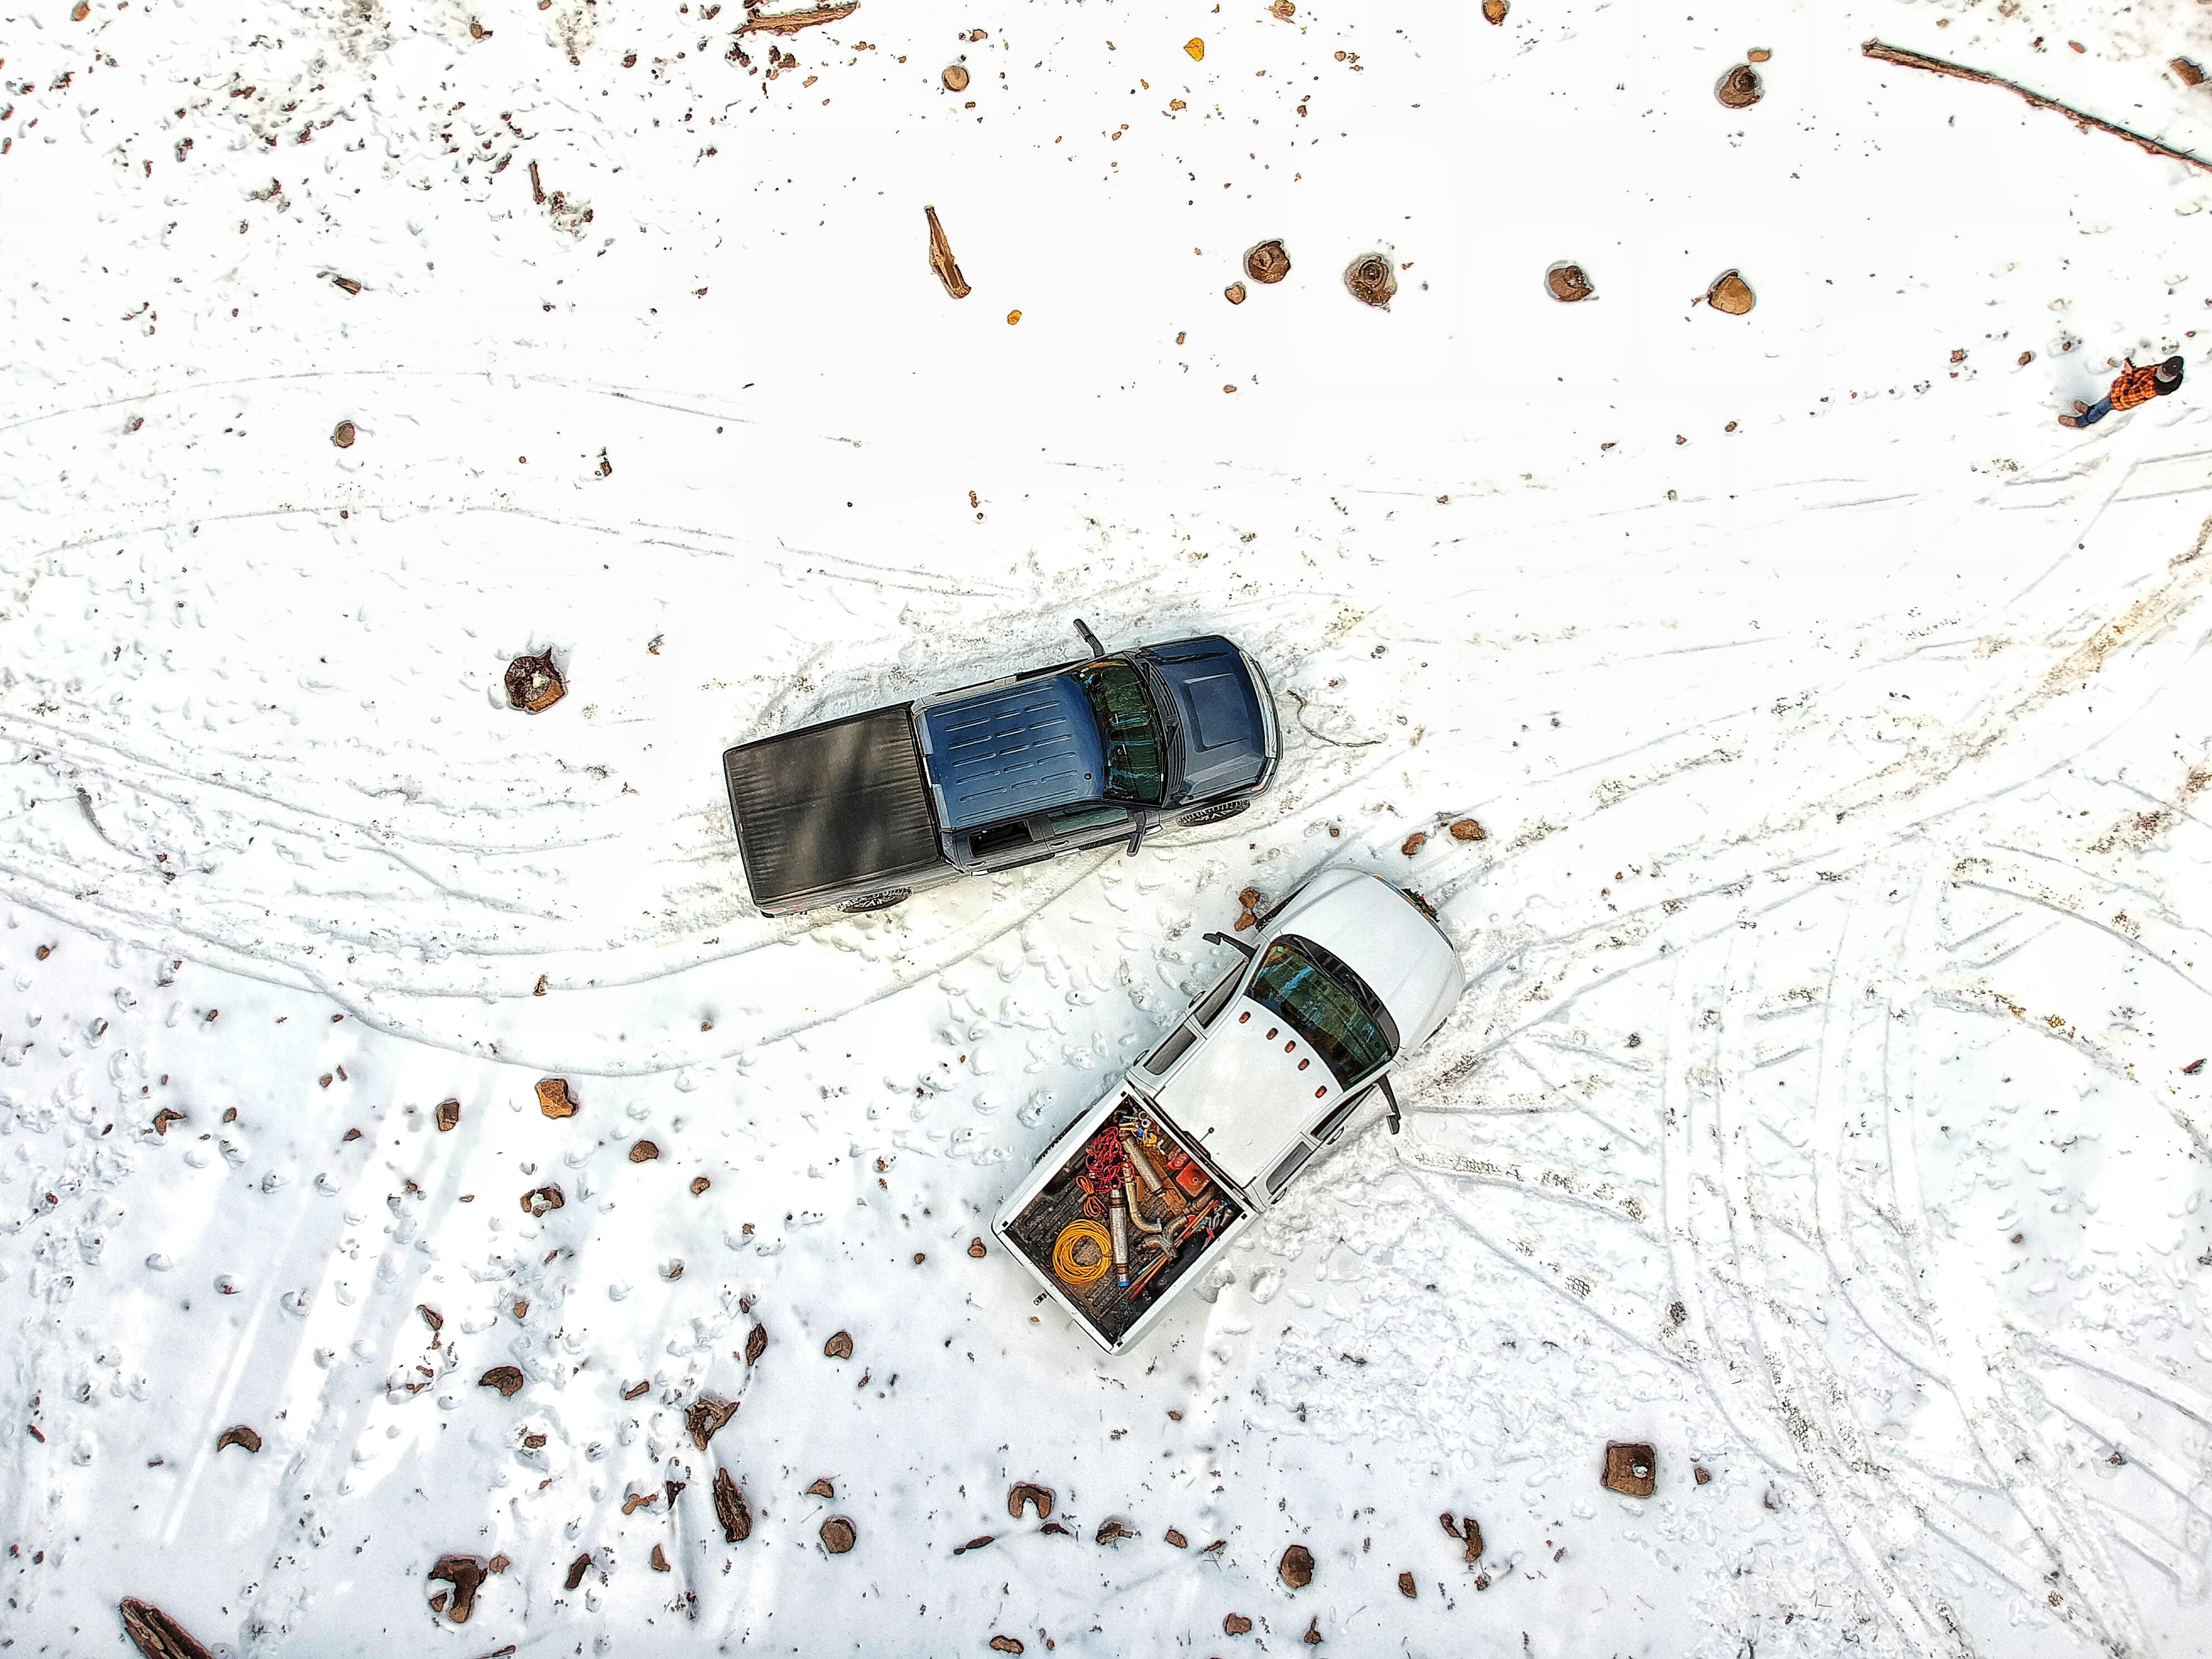 Arizona Snowventure